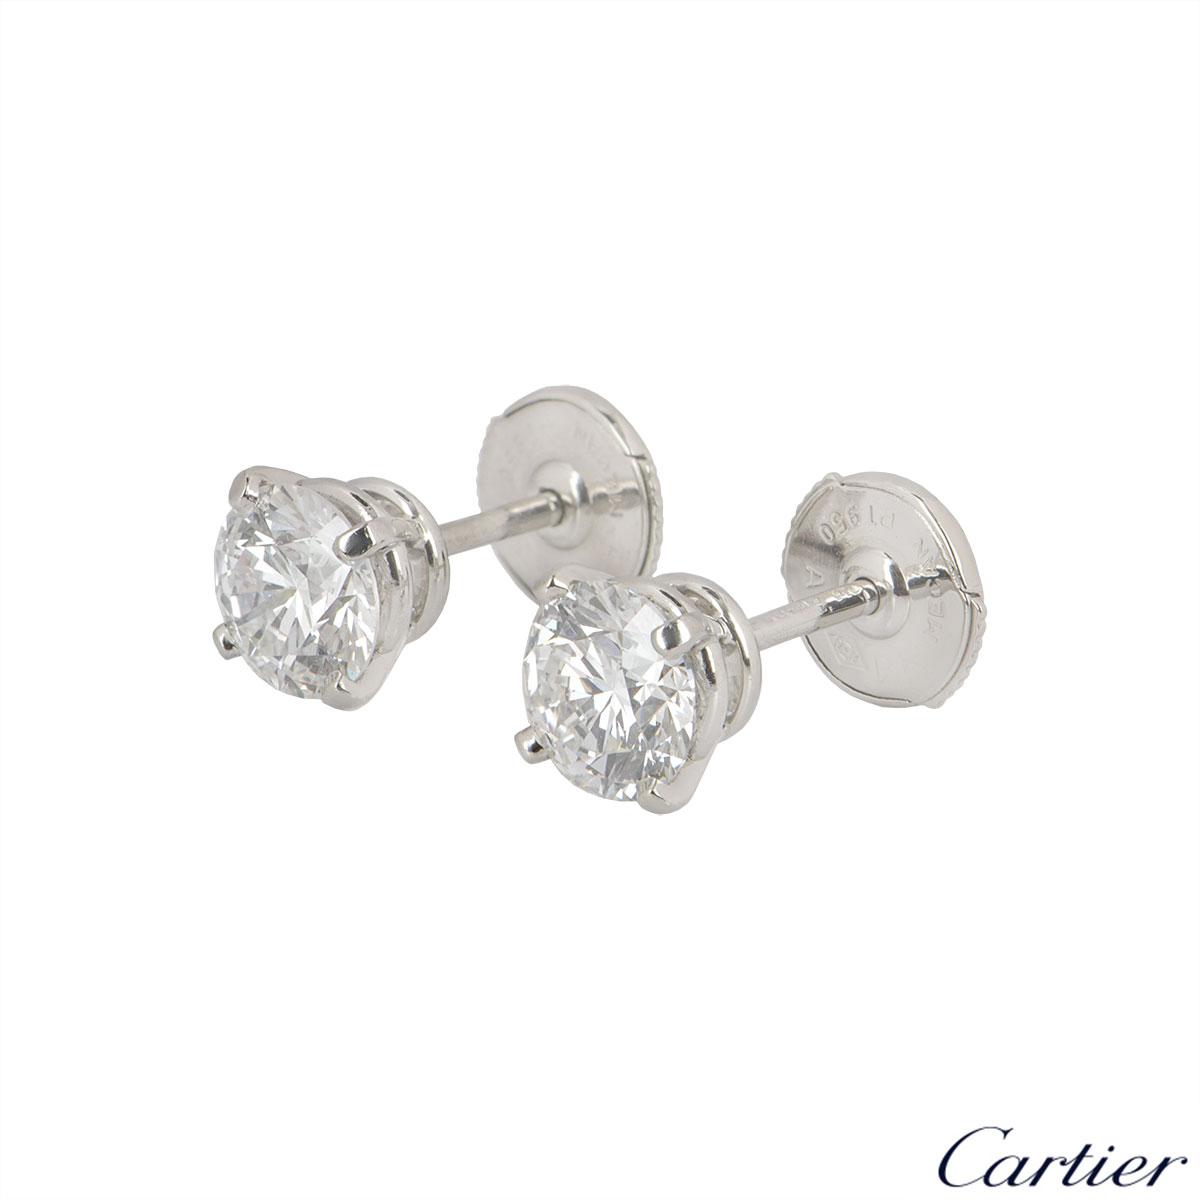 Cartier Platinum Diamond 1895 Earrings 2.01ct TDW F/VS1